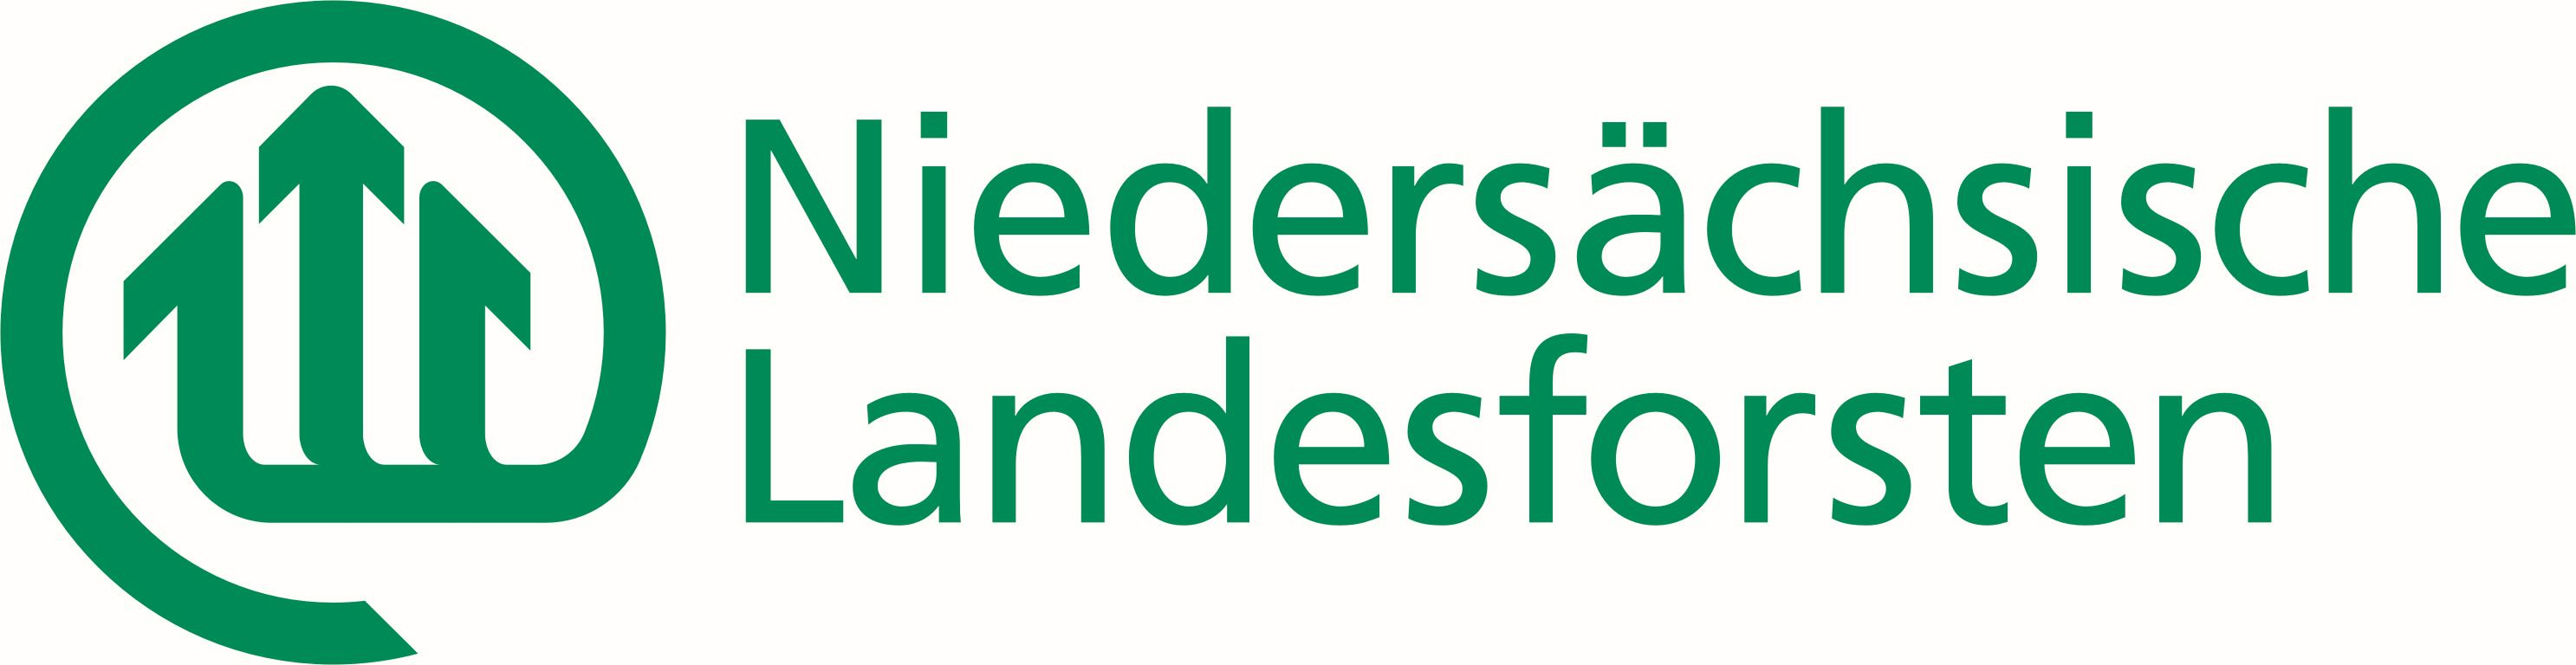 logo landesforsten